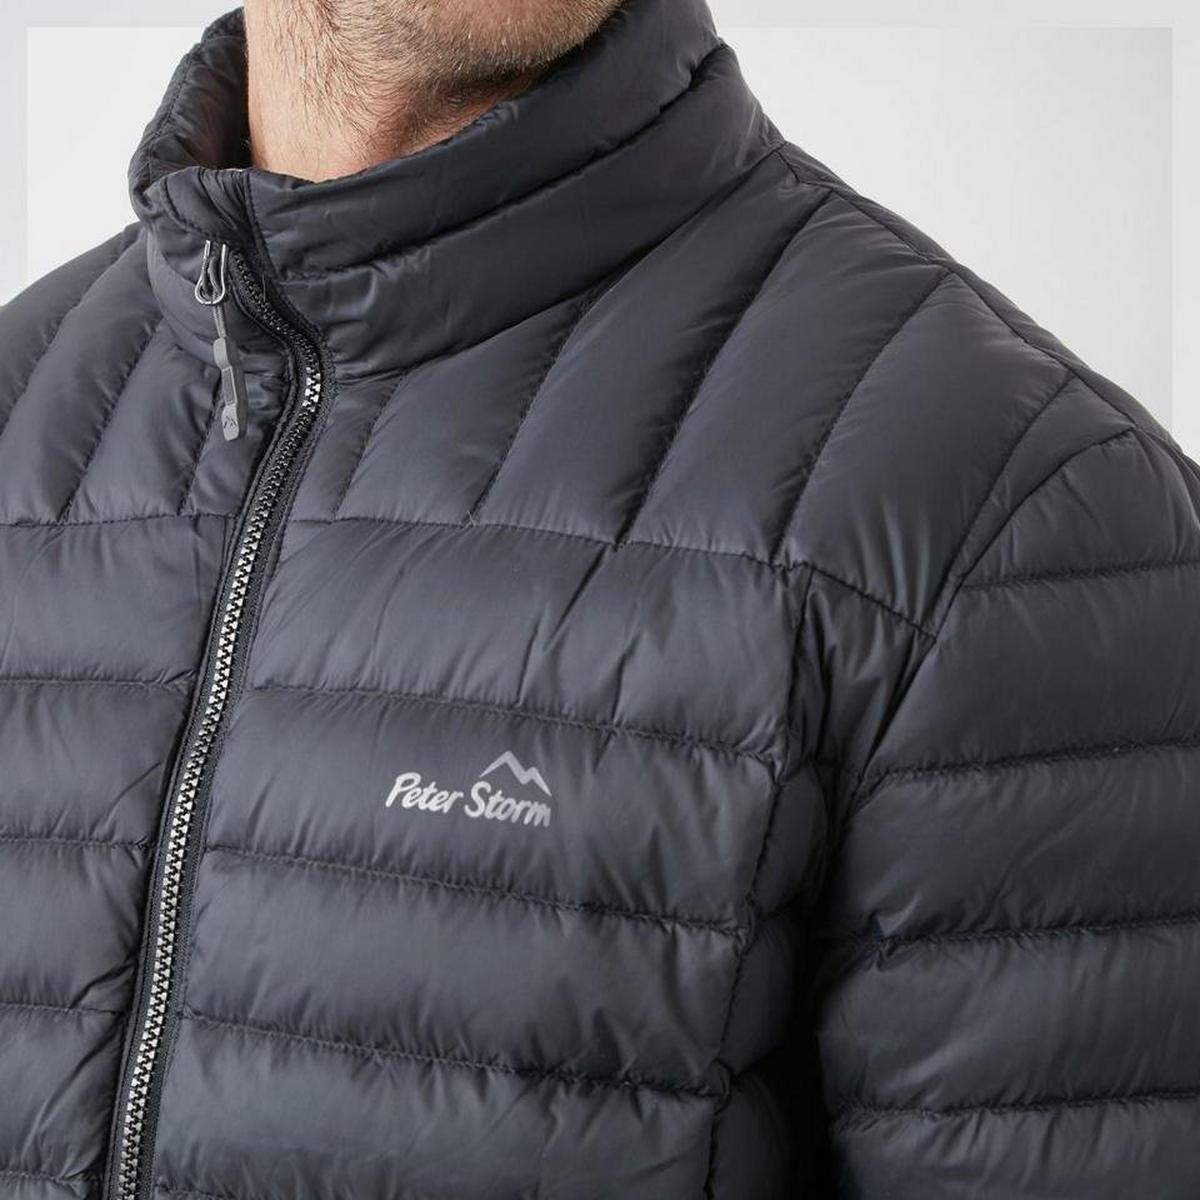 Peter Storm Men's Coastal Down Jacket II